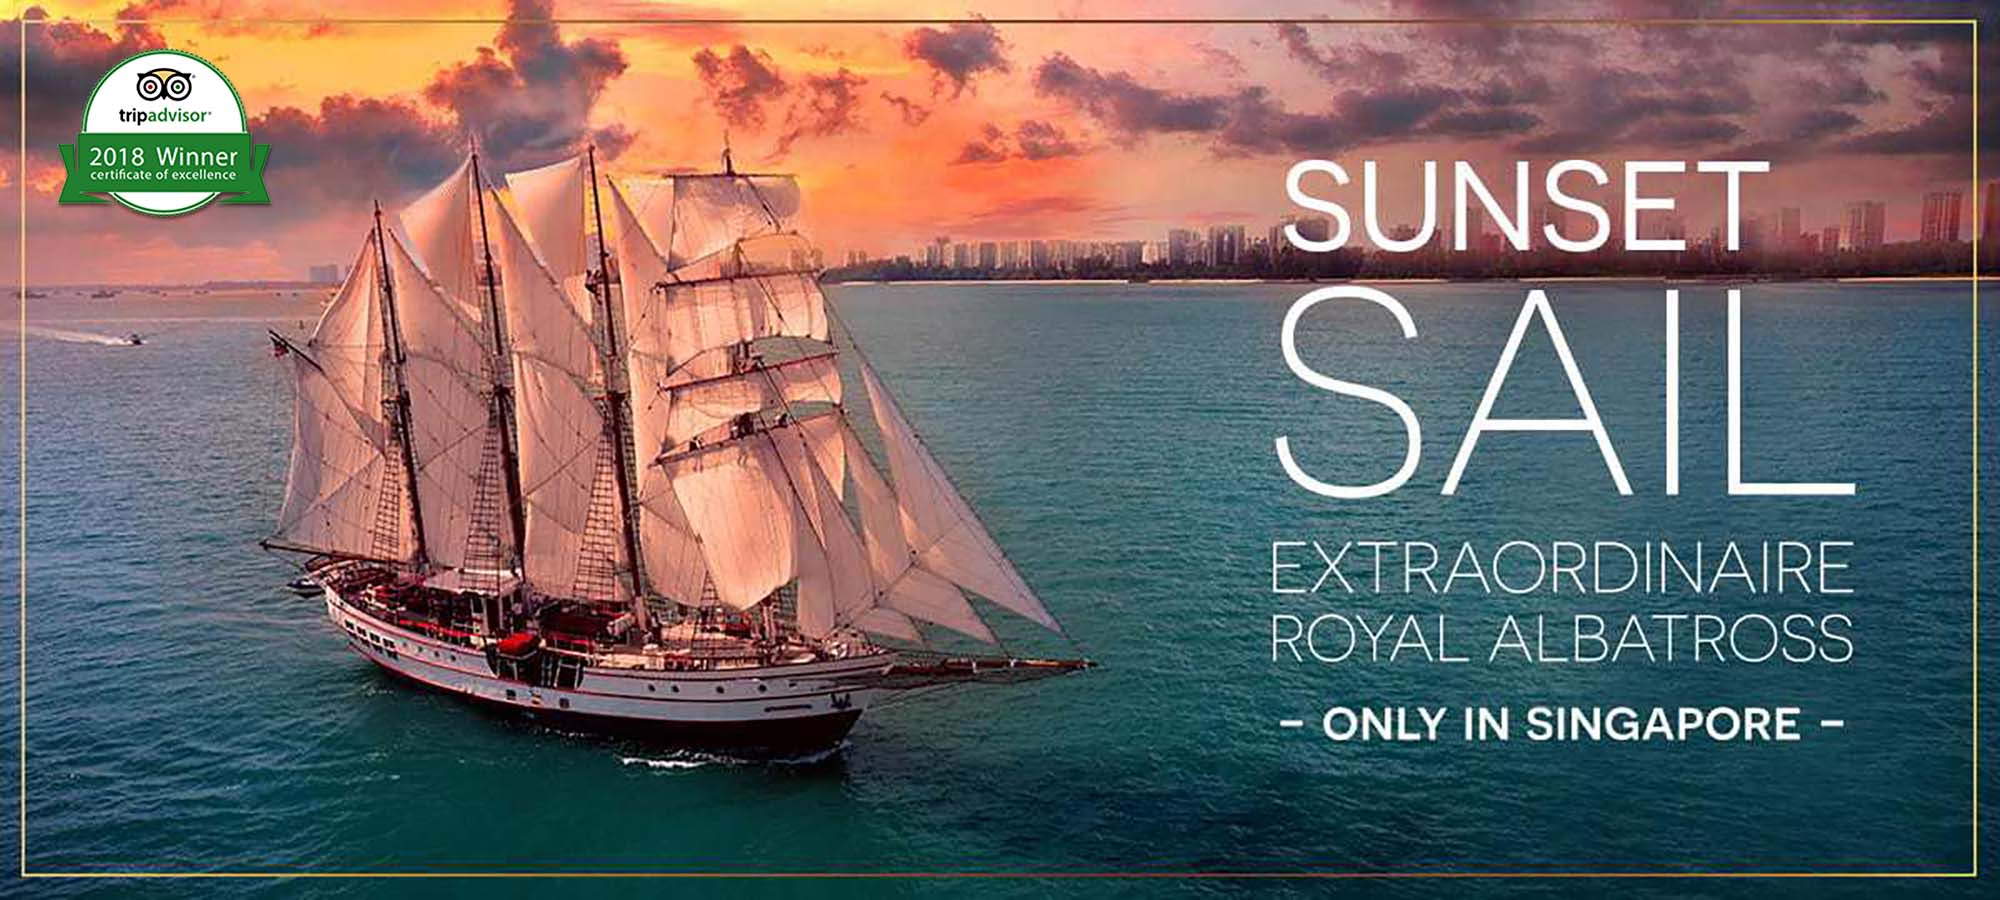 Boat Cruise Singapore - Sunset Sail City Lights